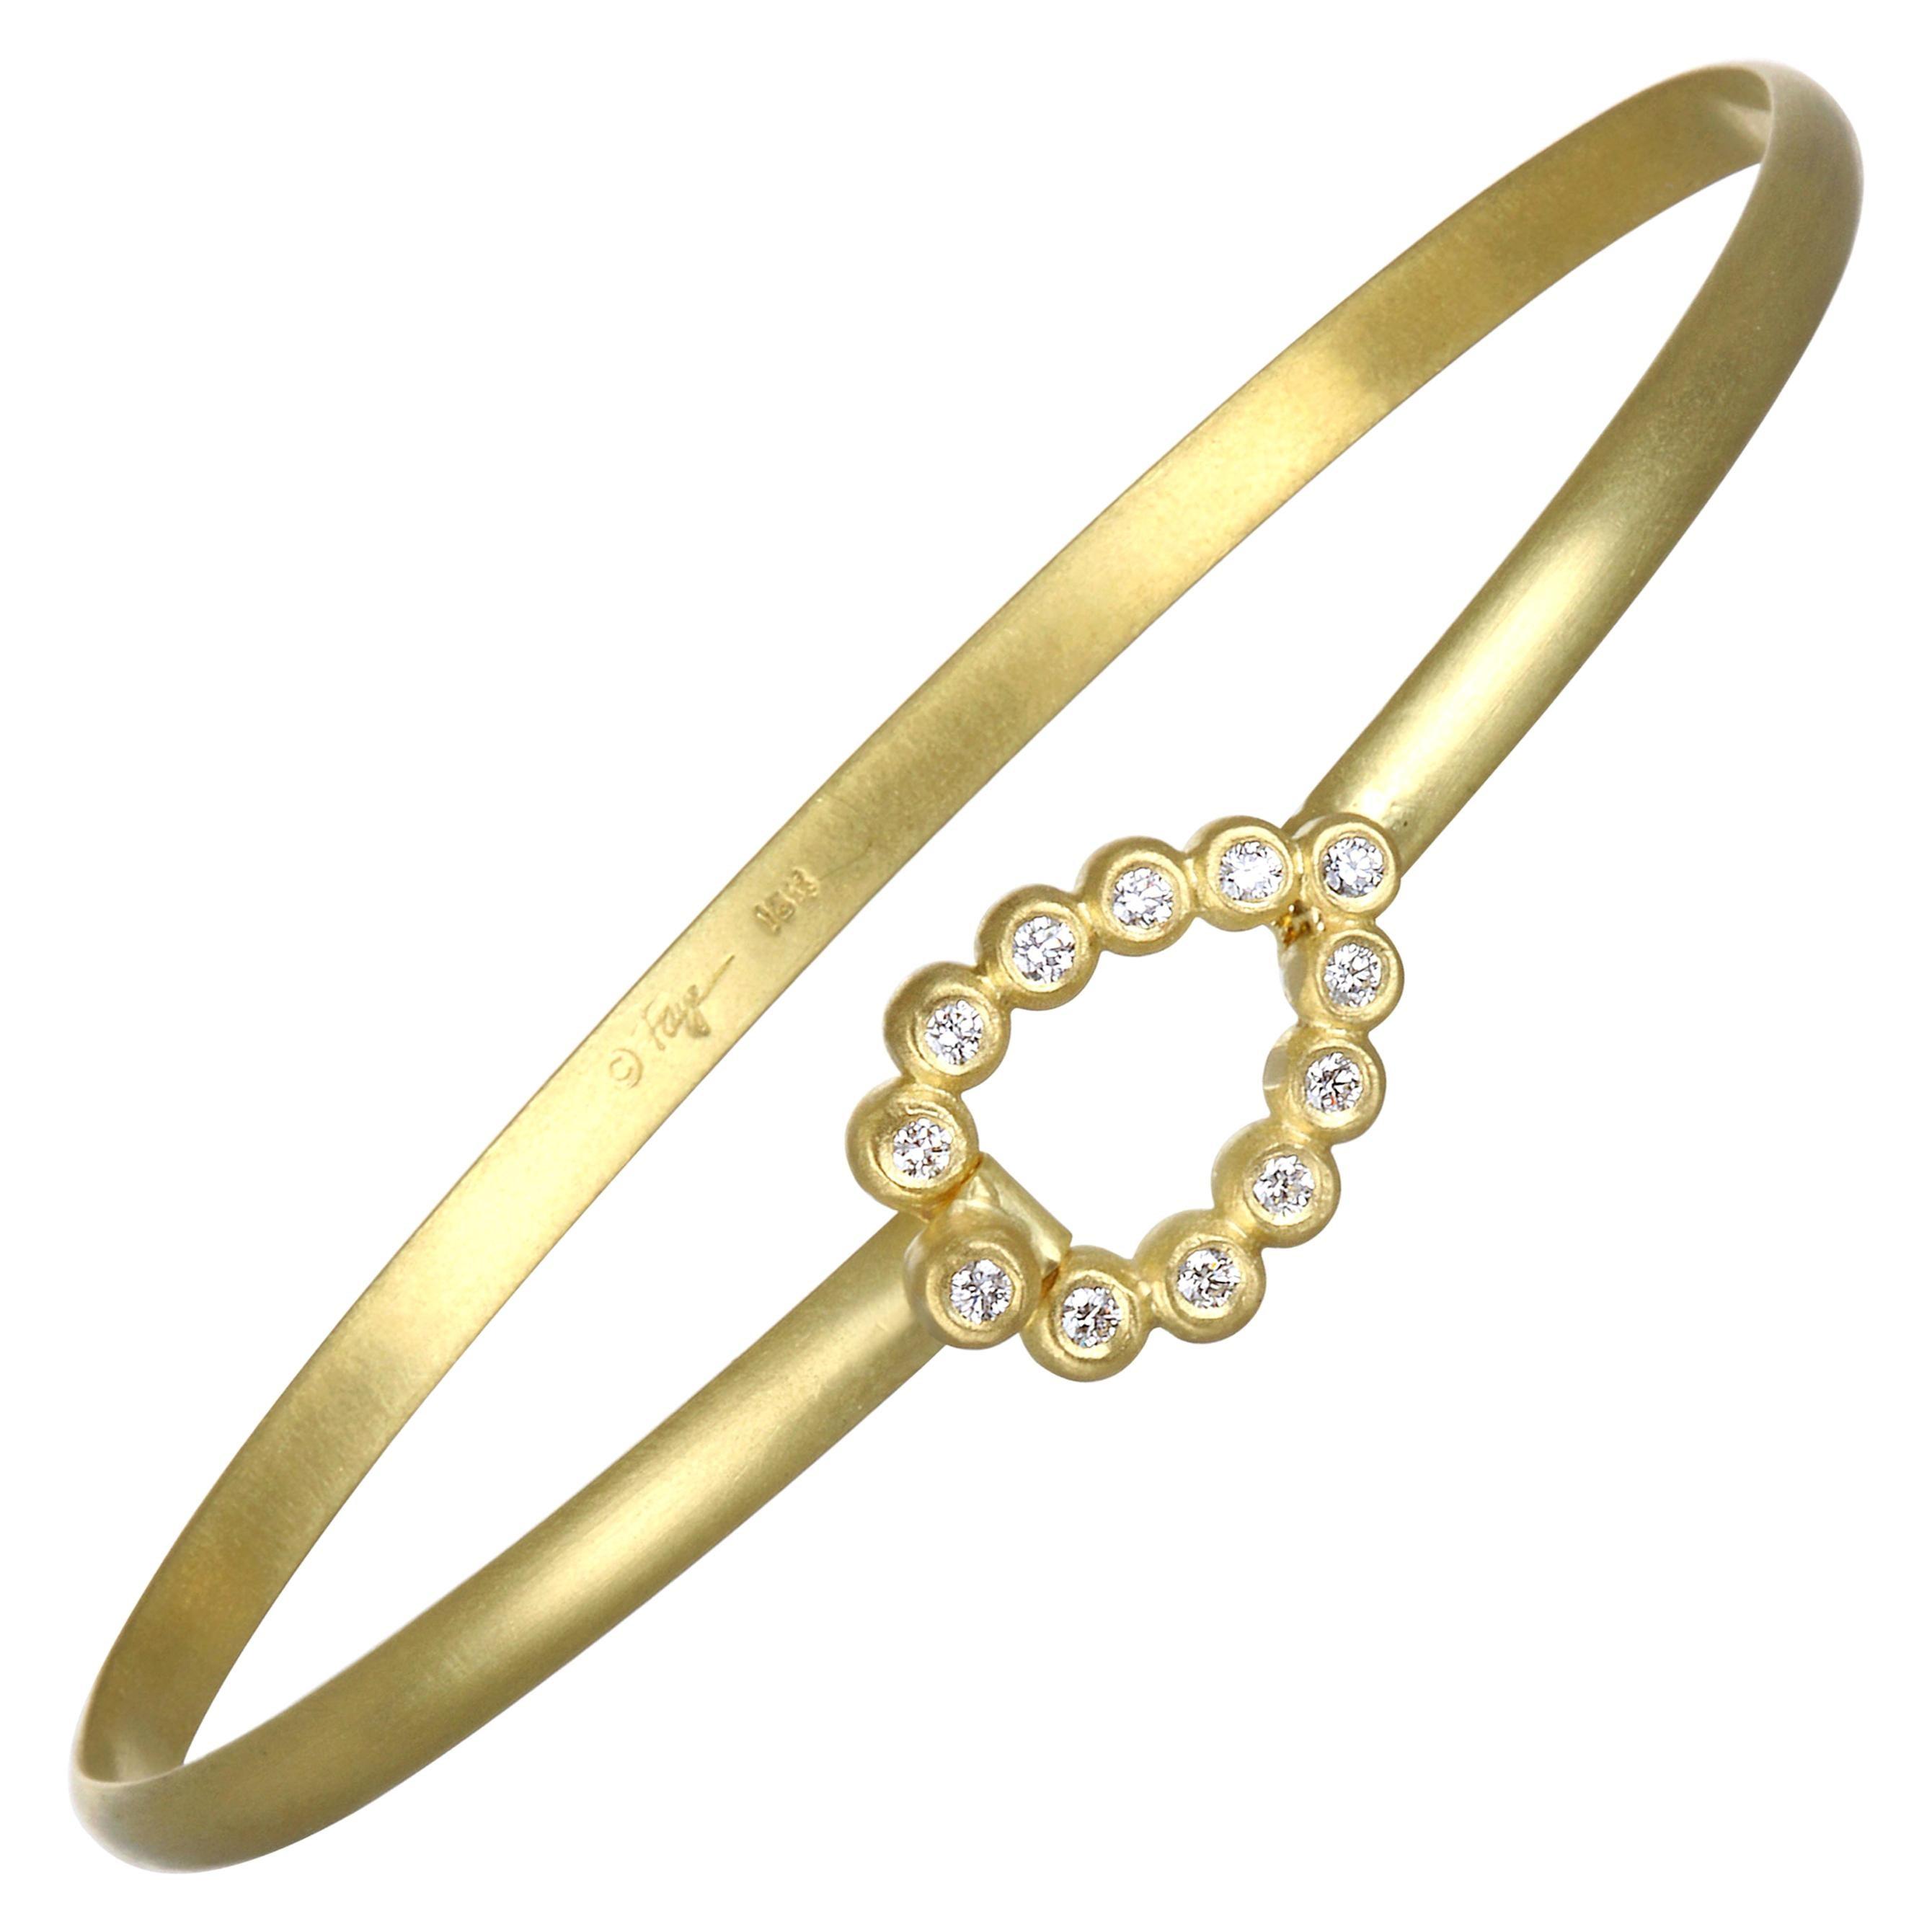 Faye Kim 18 Karat Gold Bangle Bracelet with Diamond Tear Drop Closure